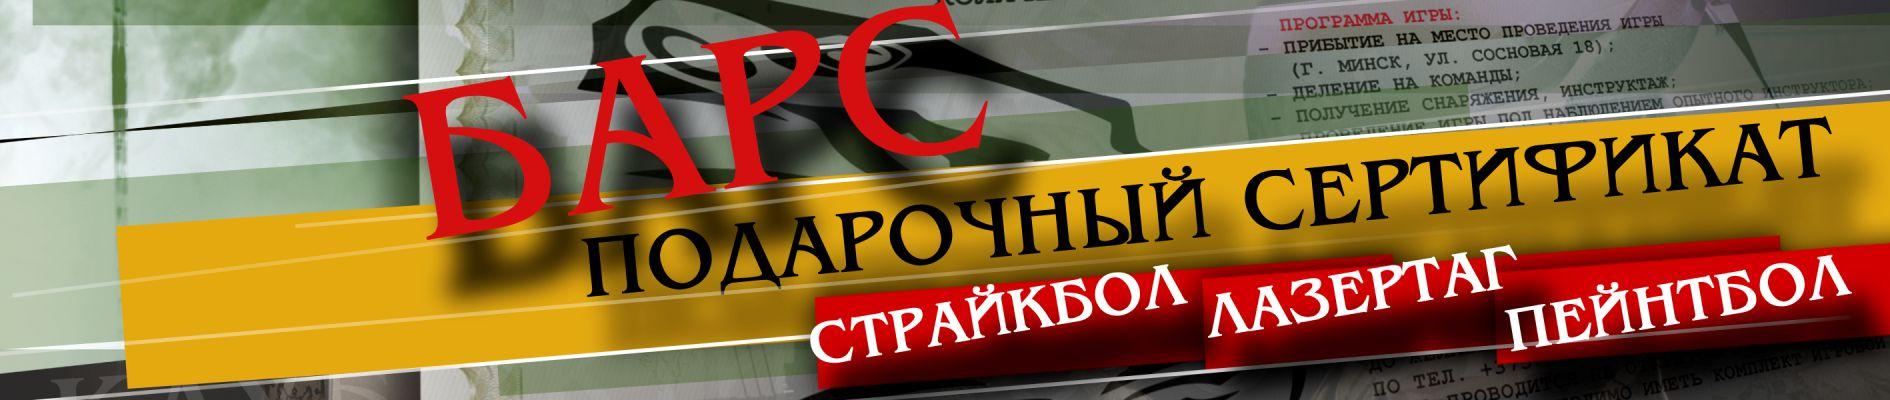 clubbars.by подарочный сертификат